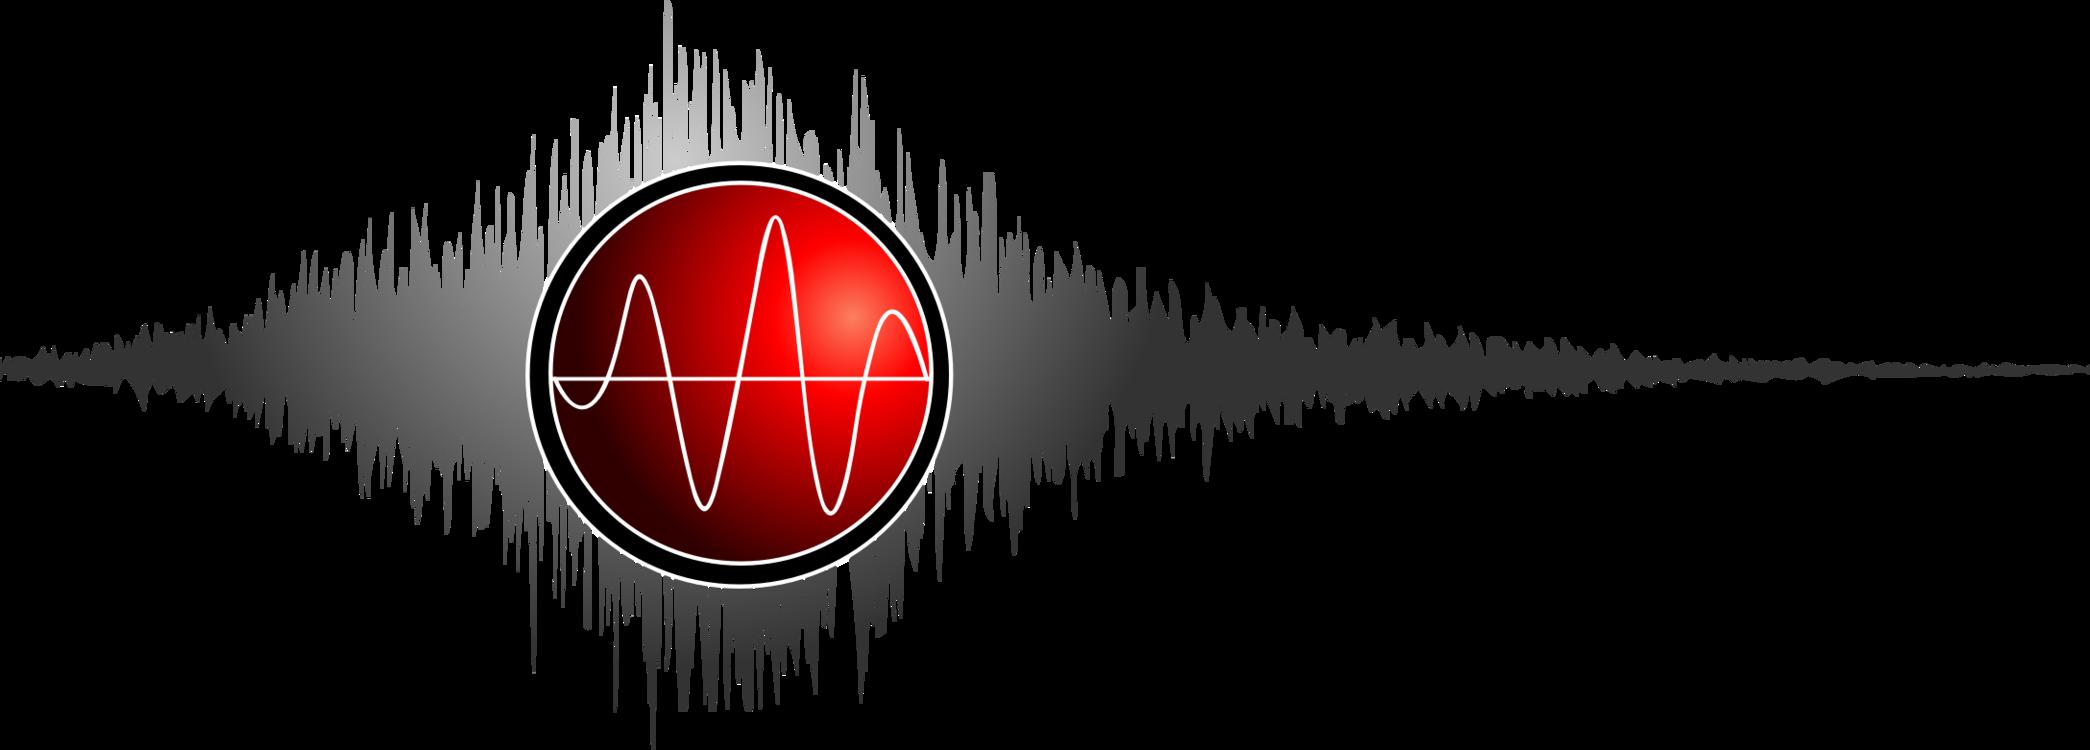 Computer Wallpaper,Logo,Red